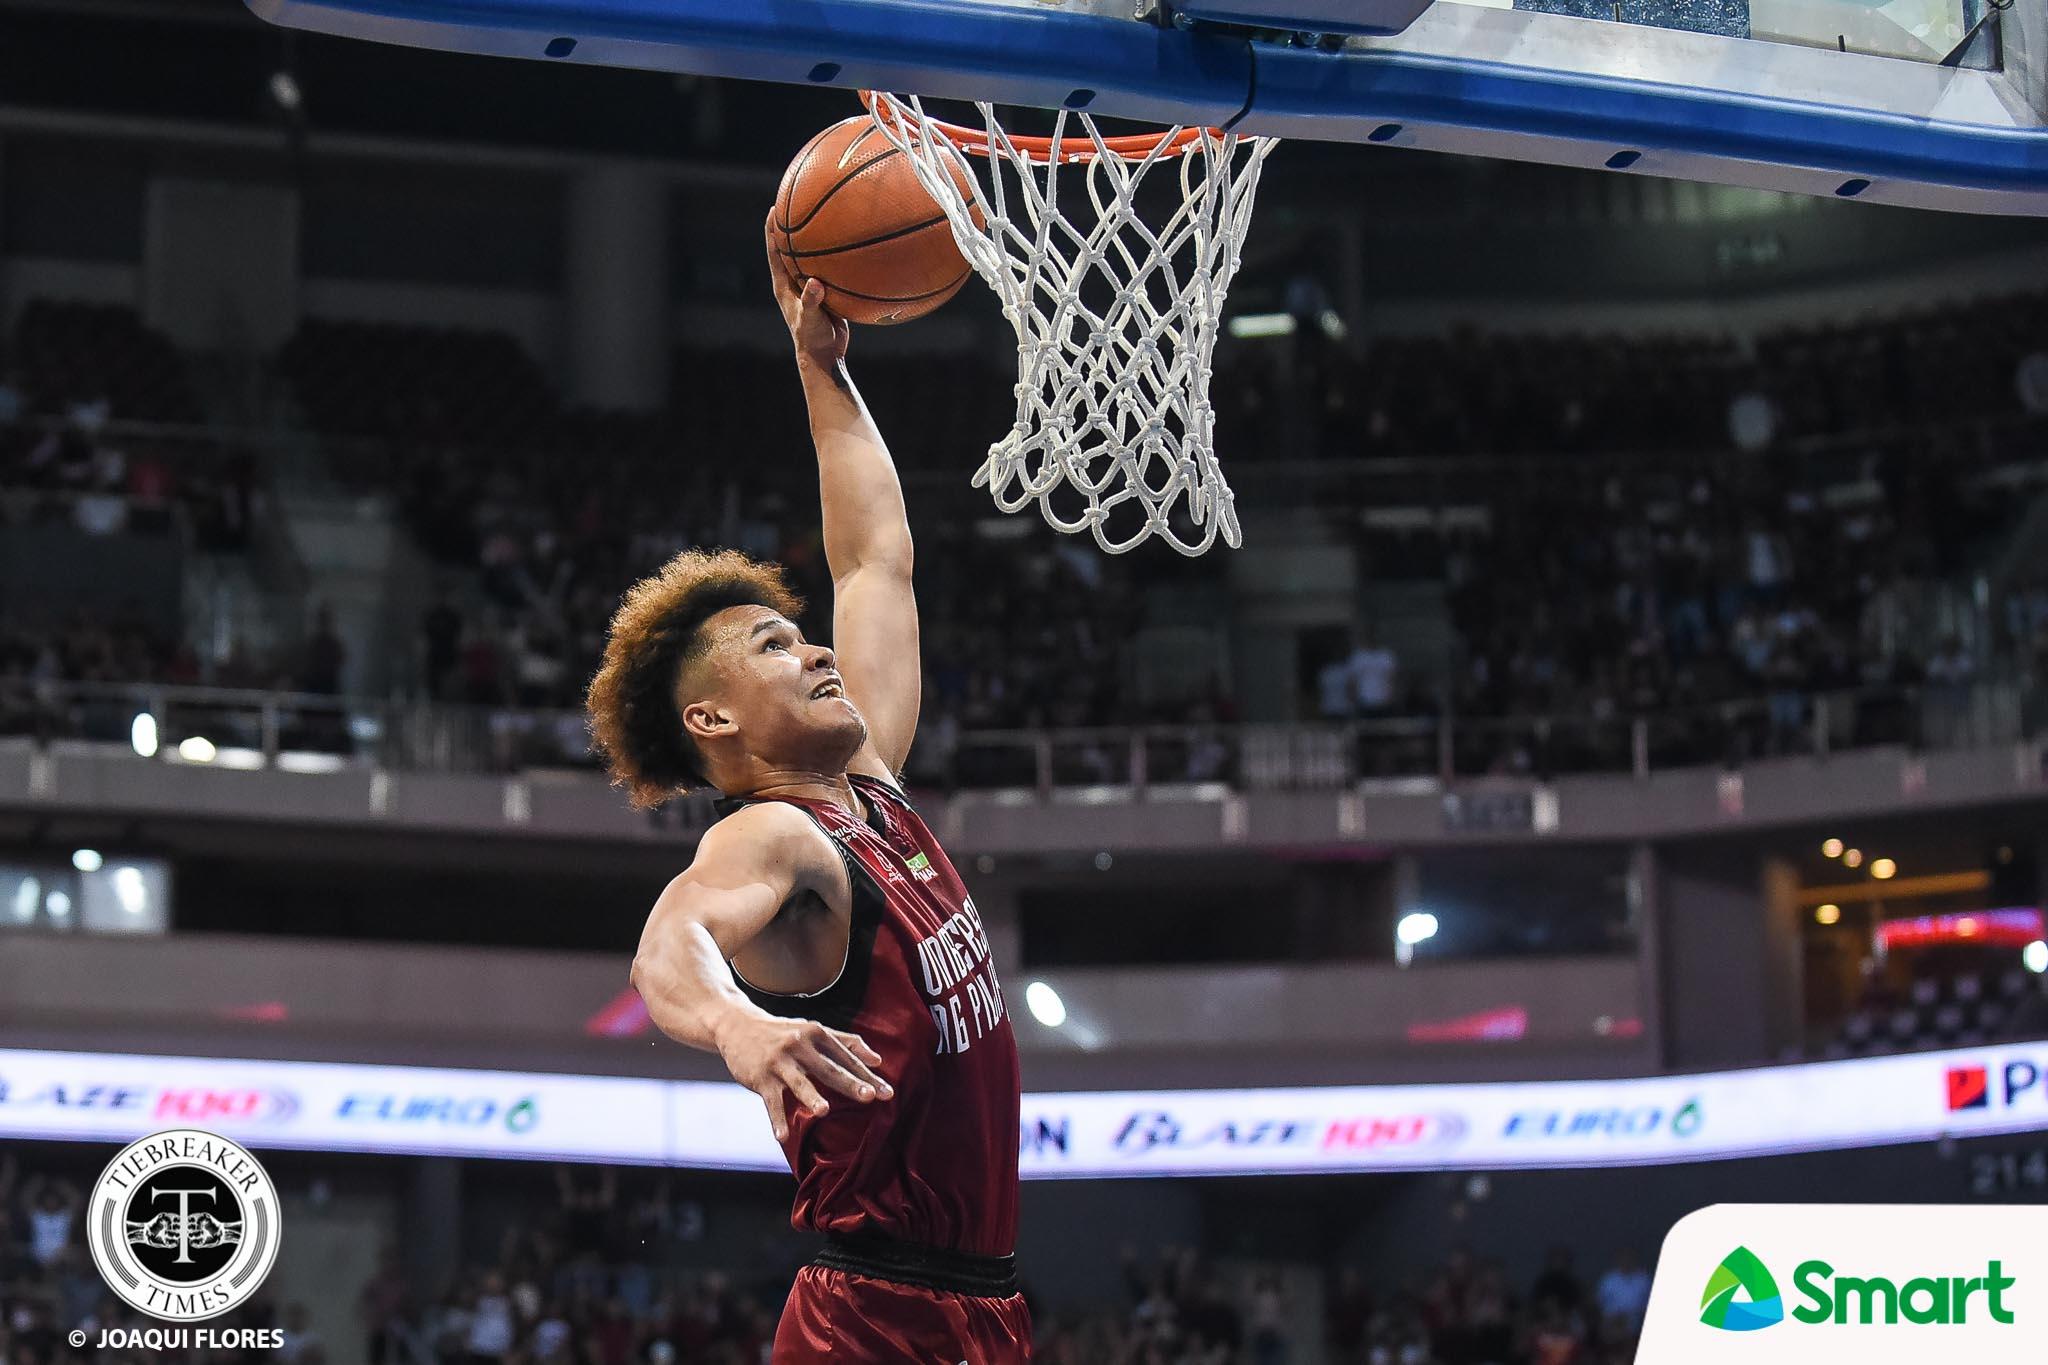 UAAP-81-Final-Four-ADU-vs.-UP-Juan-Gomez-de-Liano-6239 Juan GDL signs with B2 team Earth Friends Tokyo Z Basketball News  - philippine sports news